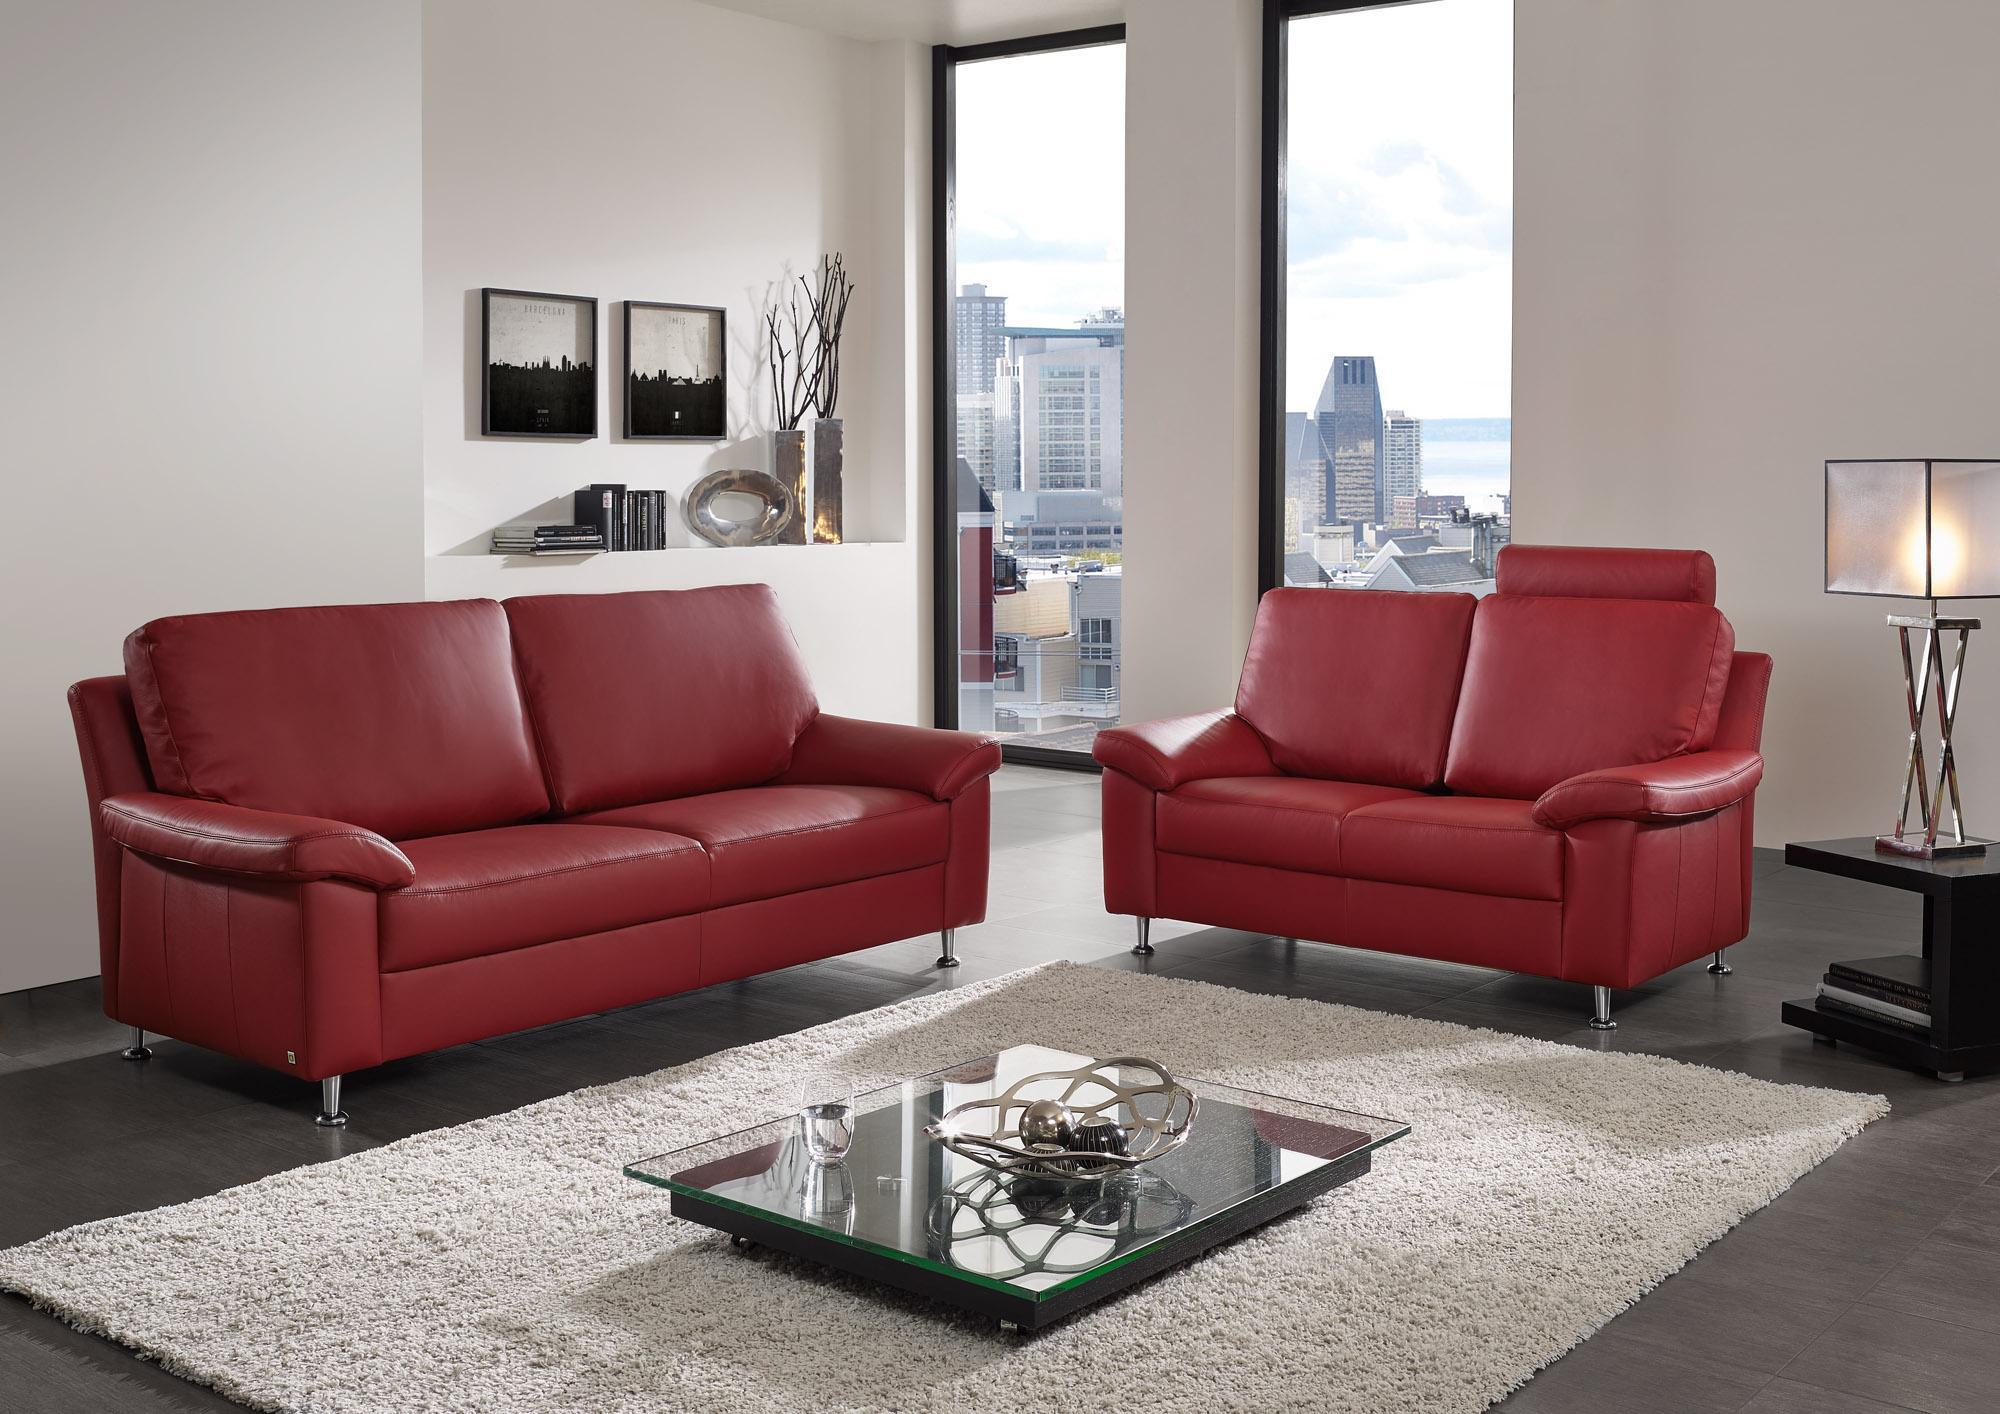 zweier couch affordable wunderbar zweier sofa pvs traumhaftes samtsofa mit zweiersofa samtbezug. Black Bedroom Furniture Sets. Home Design Ideas